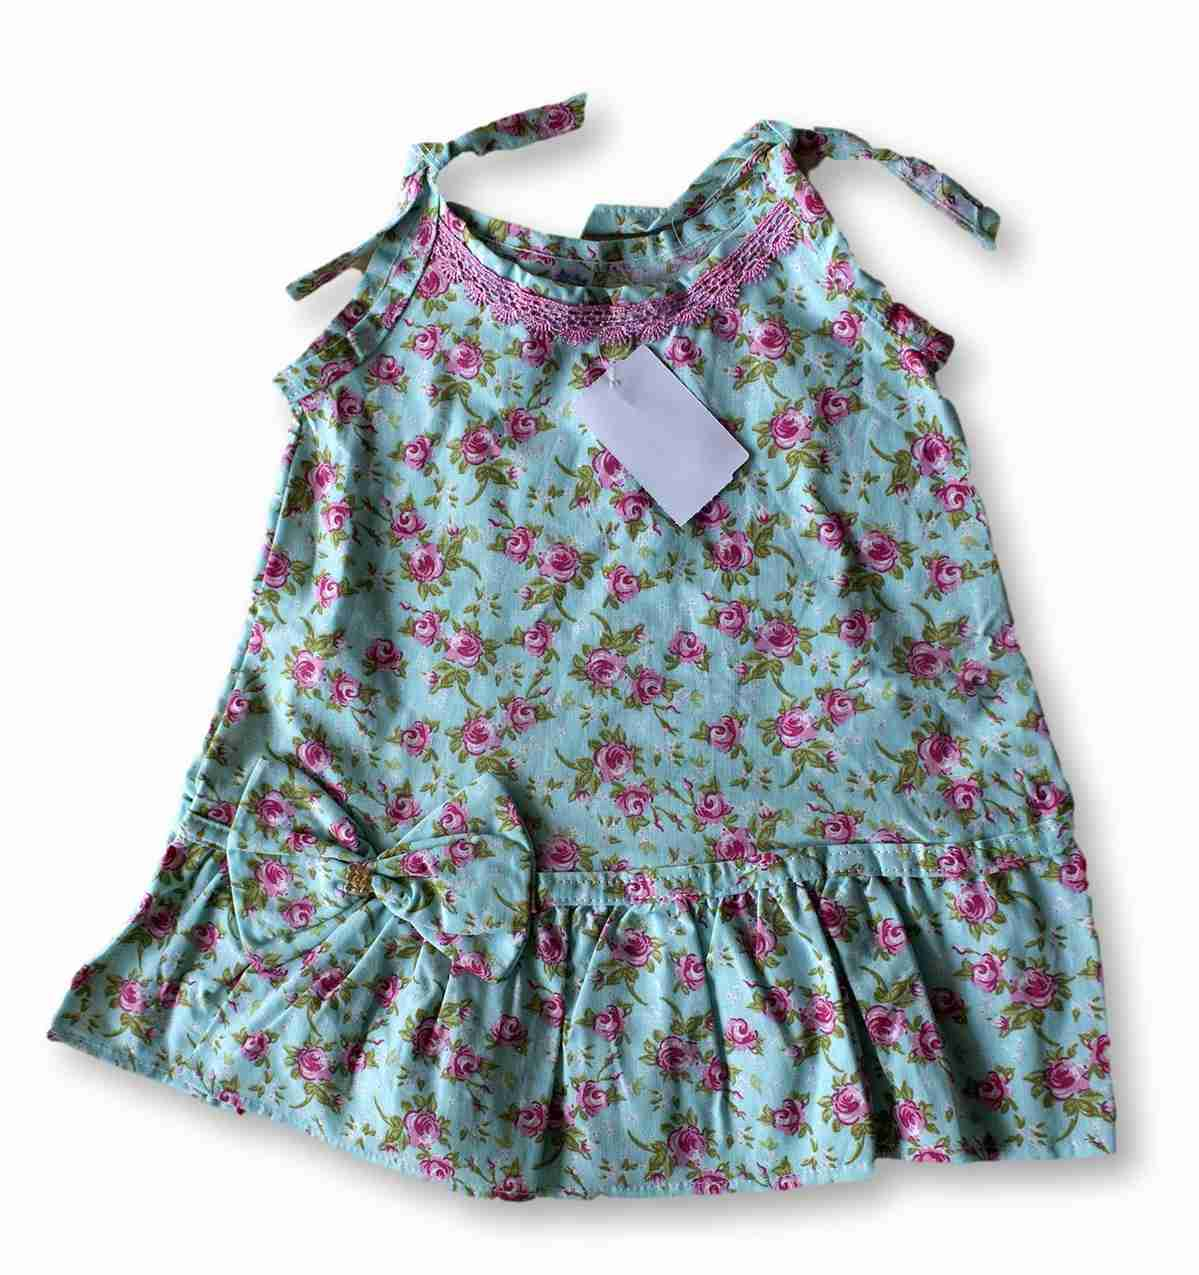 Vestido Bolero Bebê Recém Nascido Feminino Menina Cod 9092